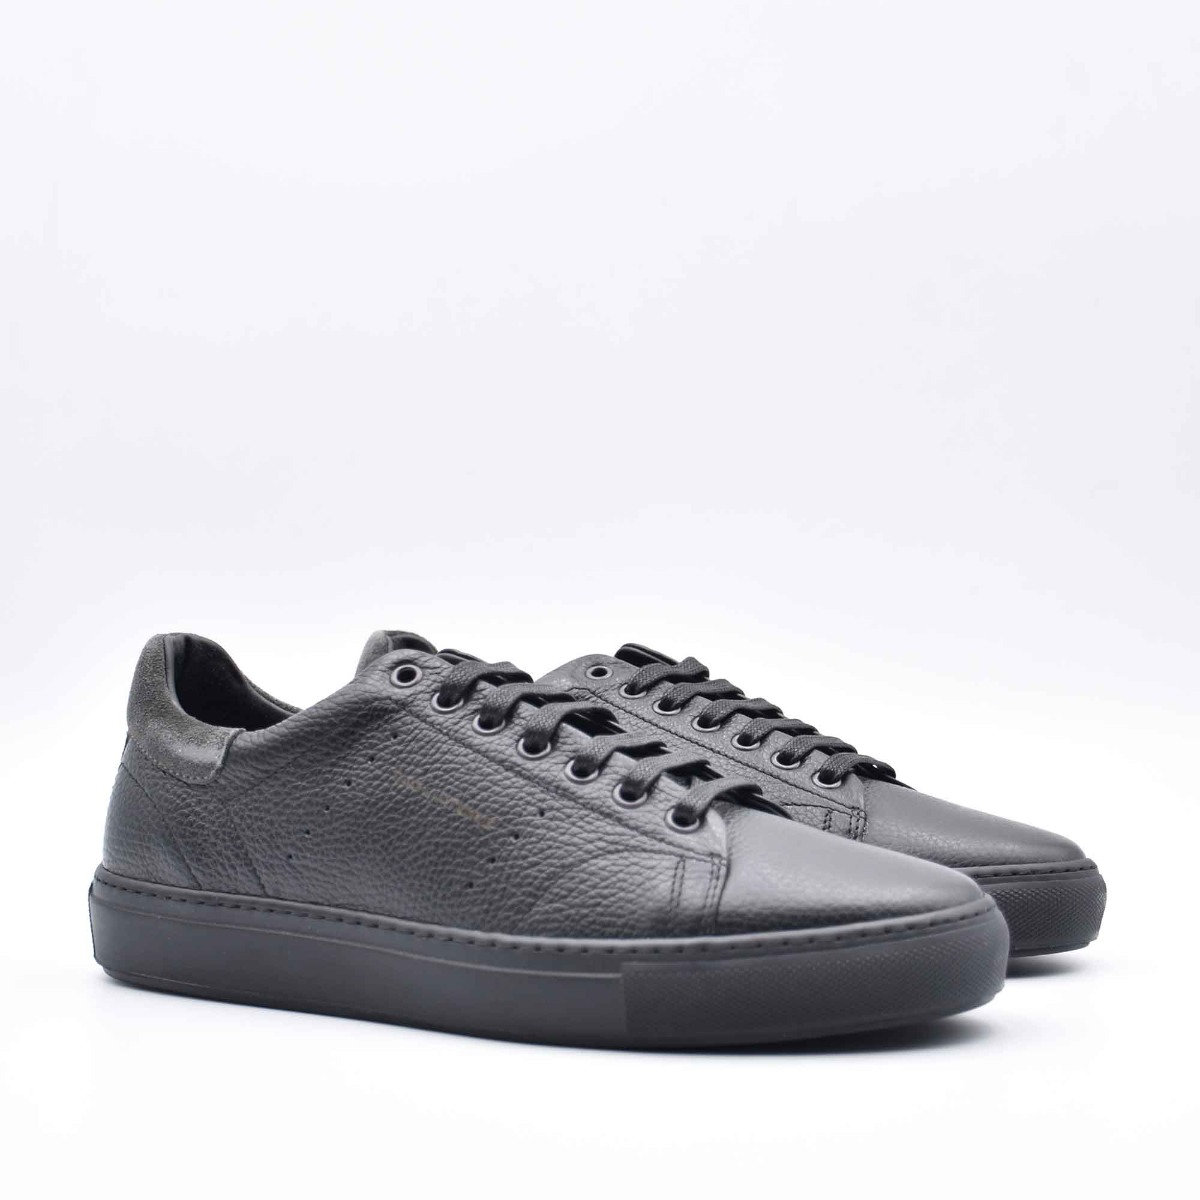 Sneakers pelle martellata- Nero